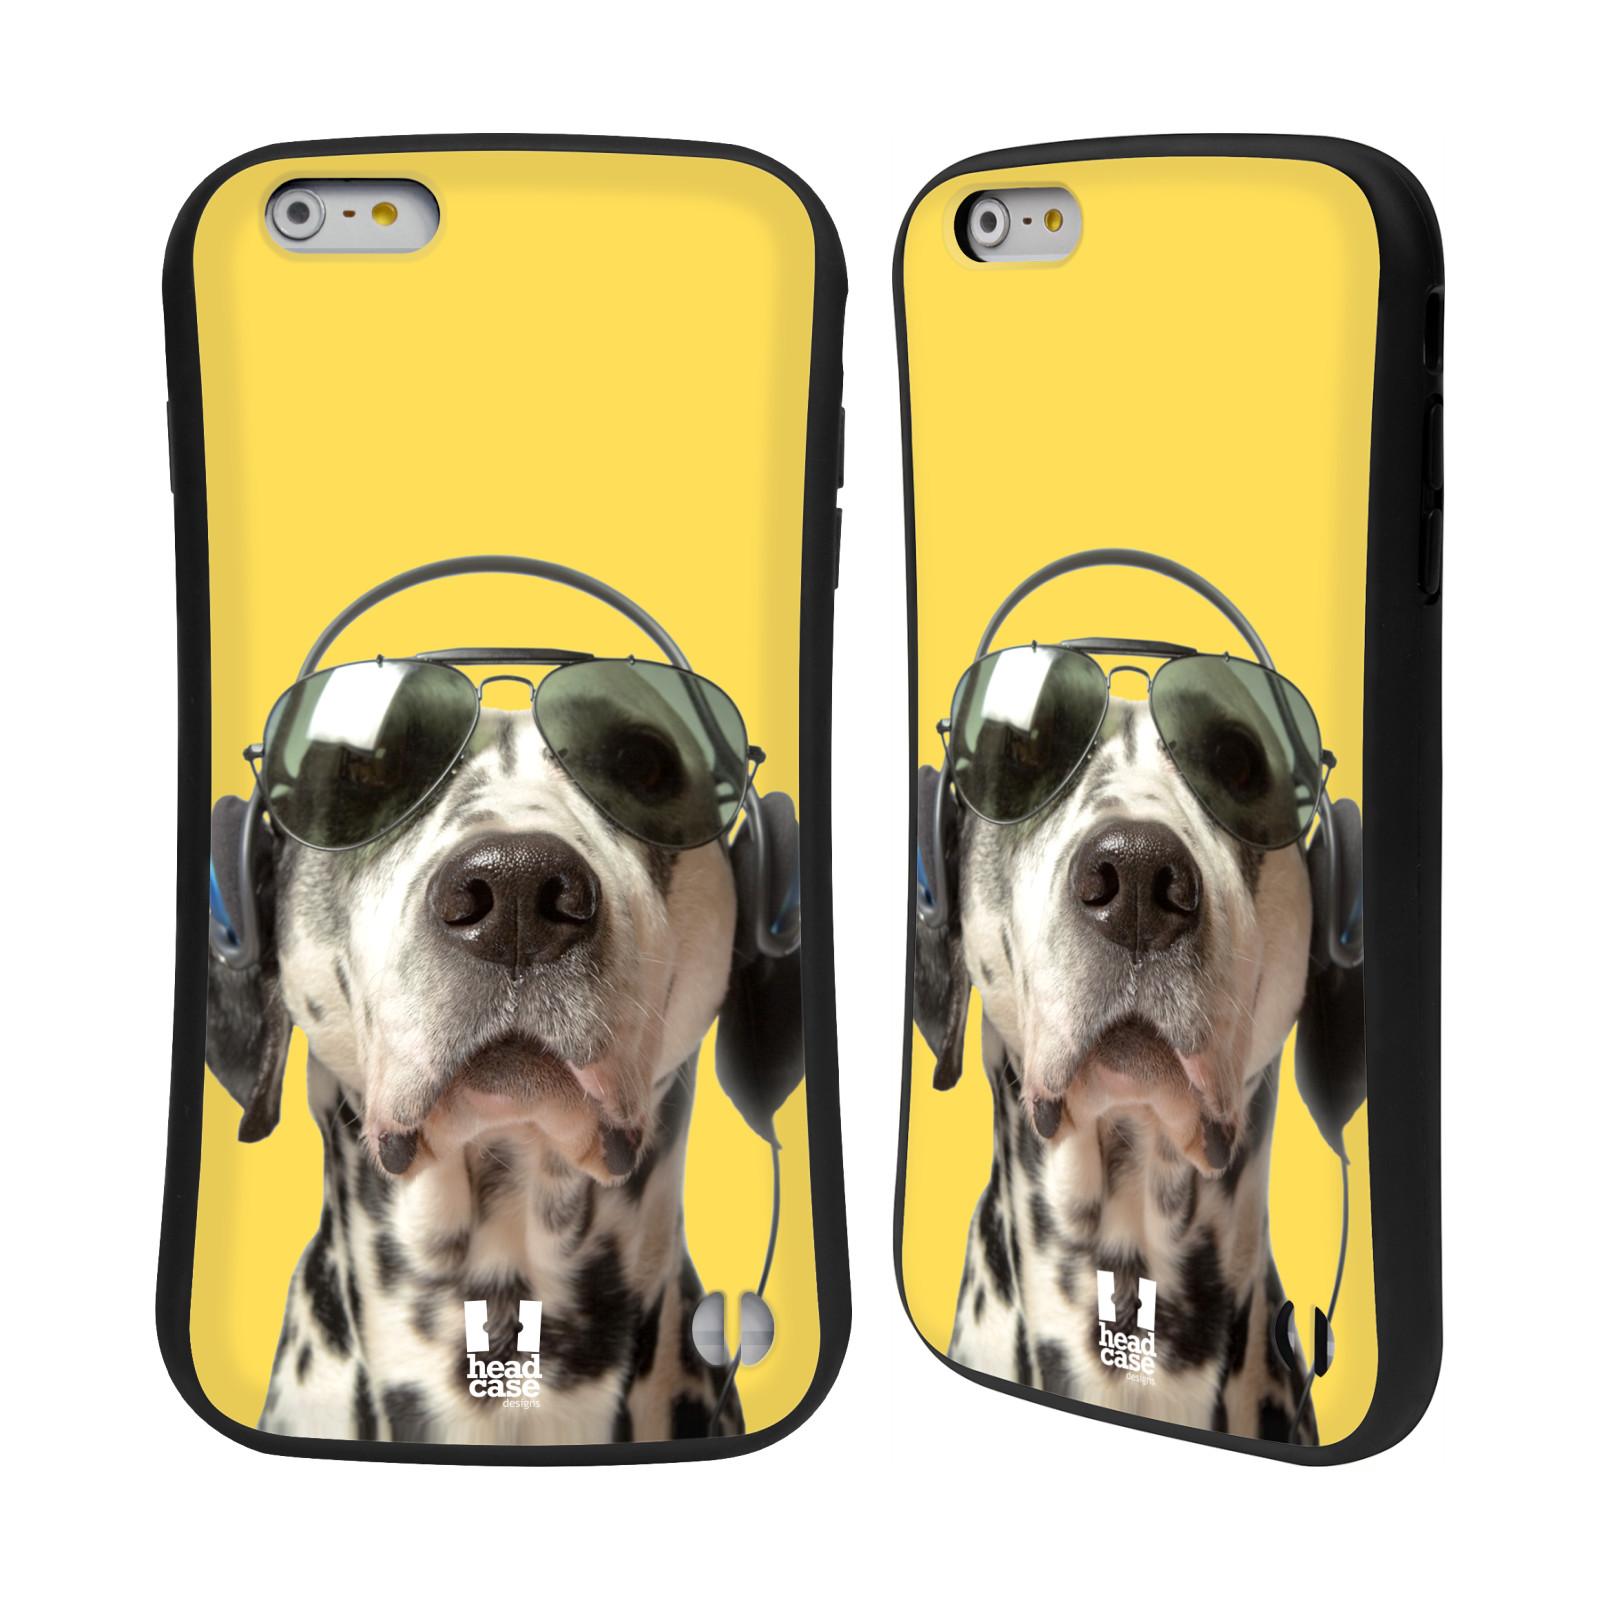 HEAD CASE silikon/plast odolný obal na mobil Apple Iphone 6 PLUS / 6S PLUS vzor Legrační zvířátka dalmatin se sluchátky žlutá